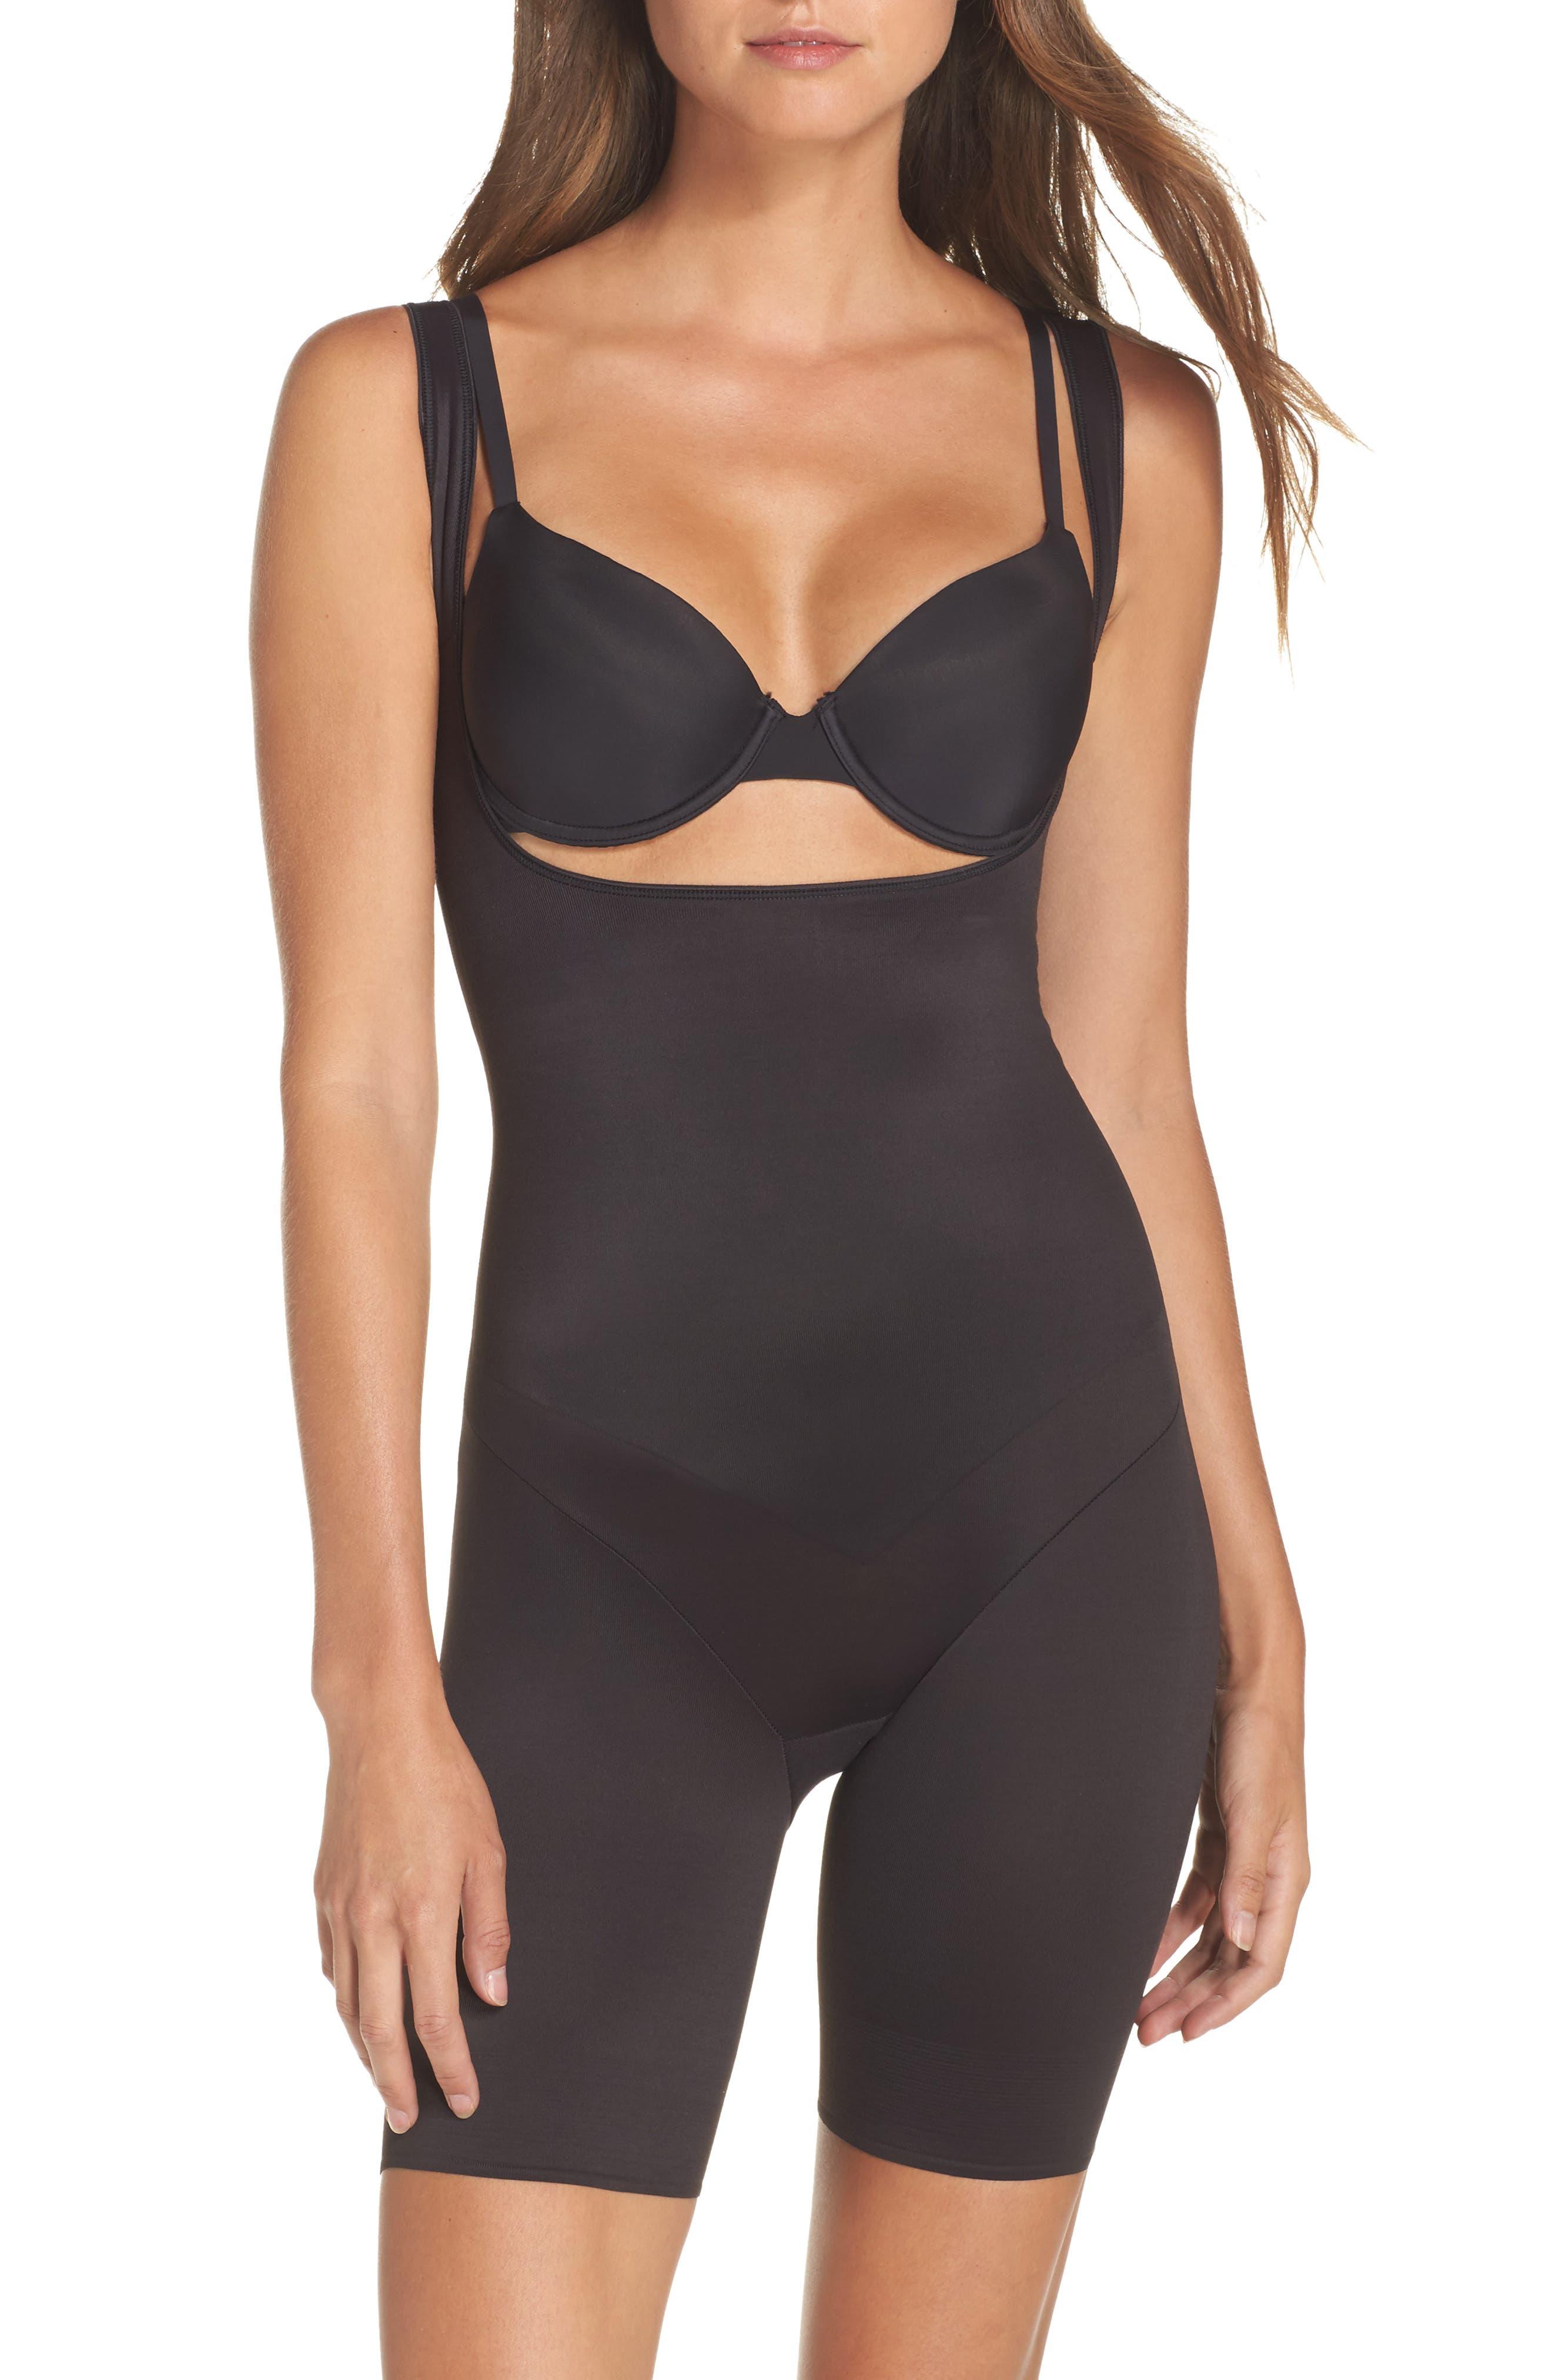 Torsette Underbust Mid Thigh Bodysuit Shaper,                             Alternate thumbnail 2, color,                             BLACK